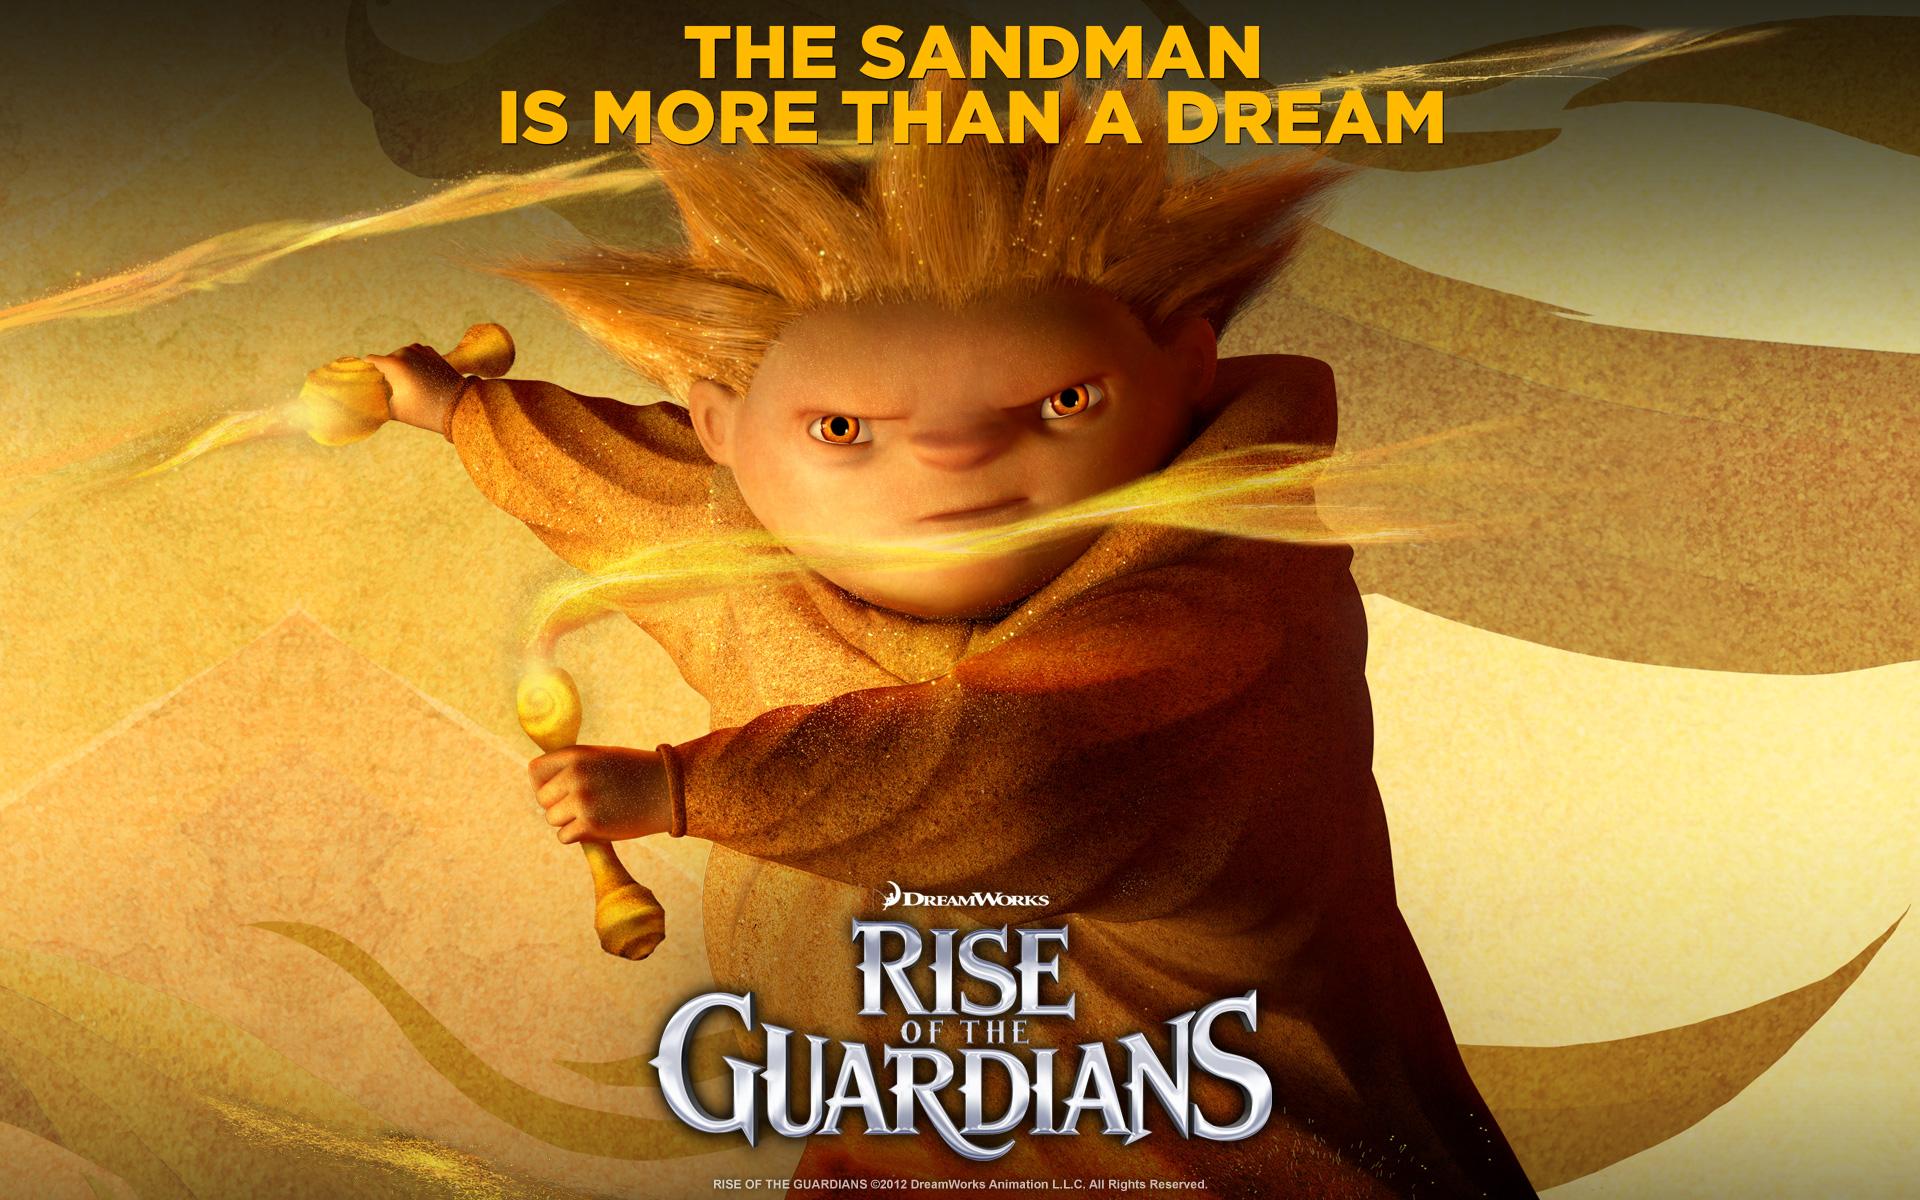 The sandman rise of the guardians movie mystery wallpaper rise of the guardians movie wallpaper orginal size 1920 x 1200 altavistaventures Choice Image